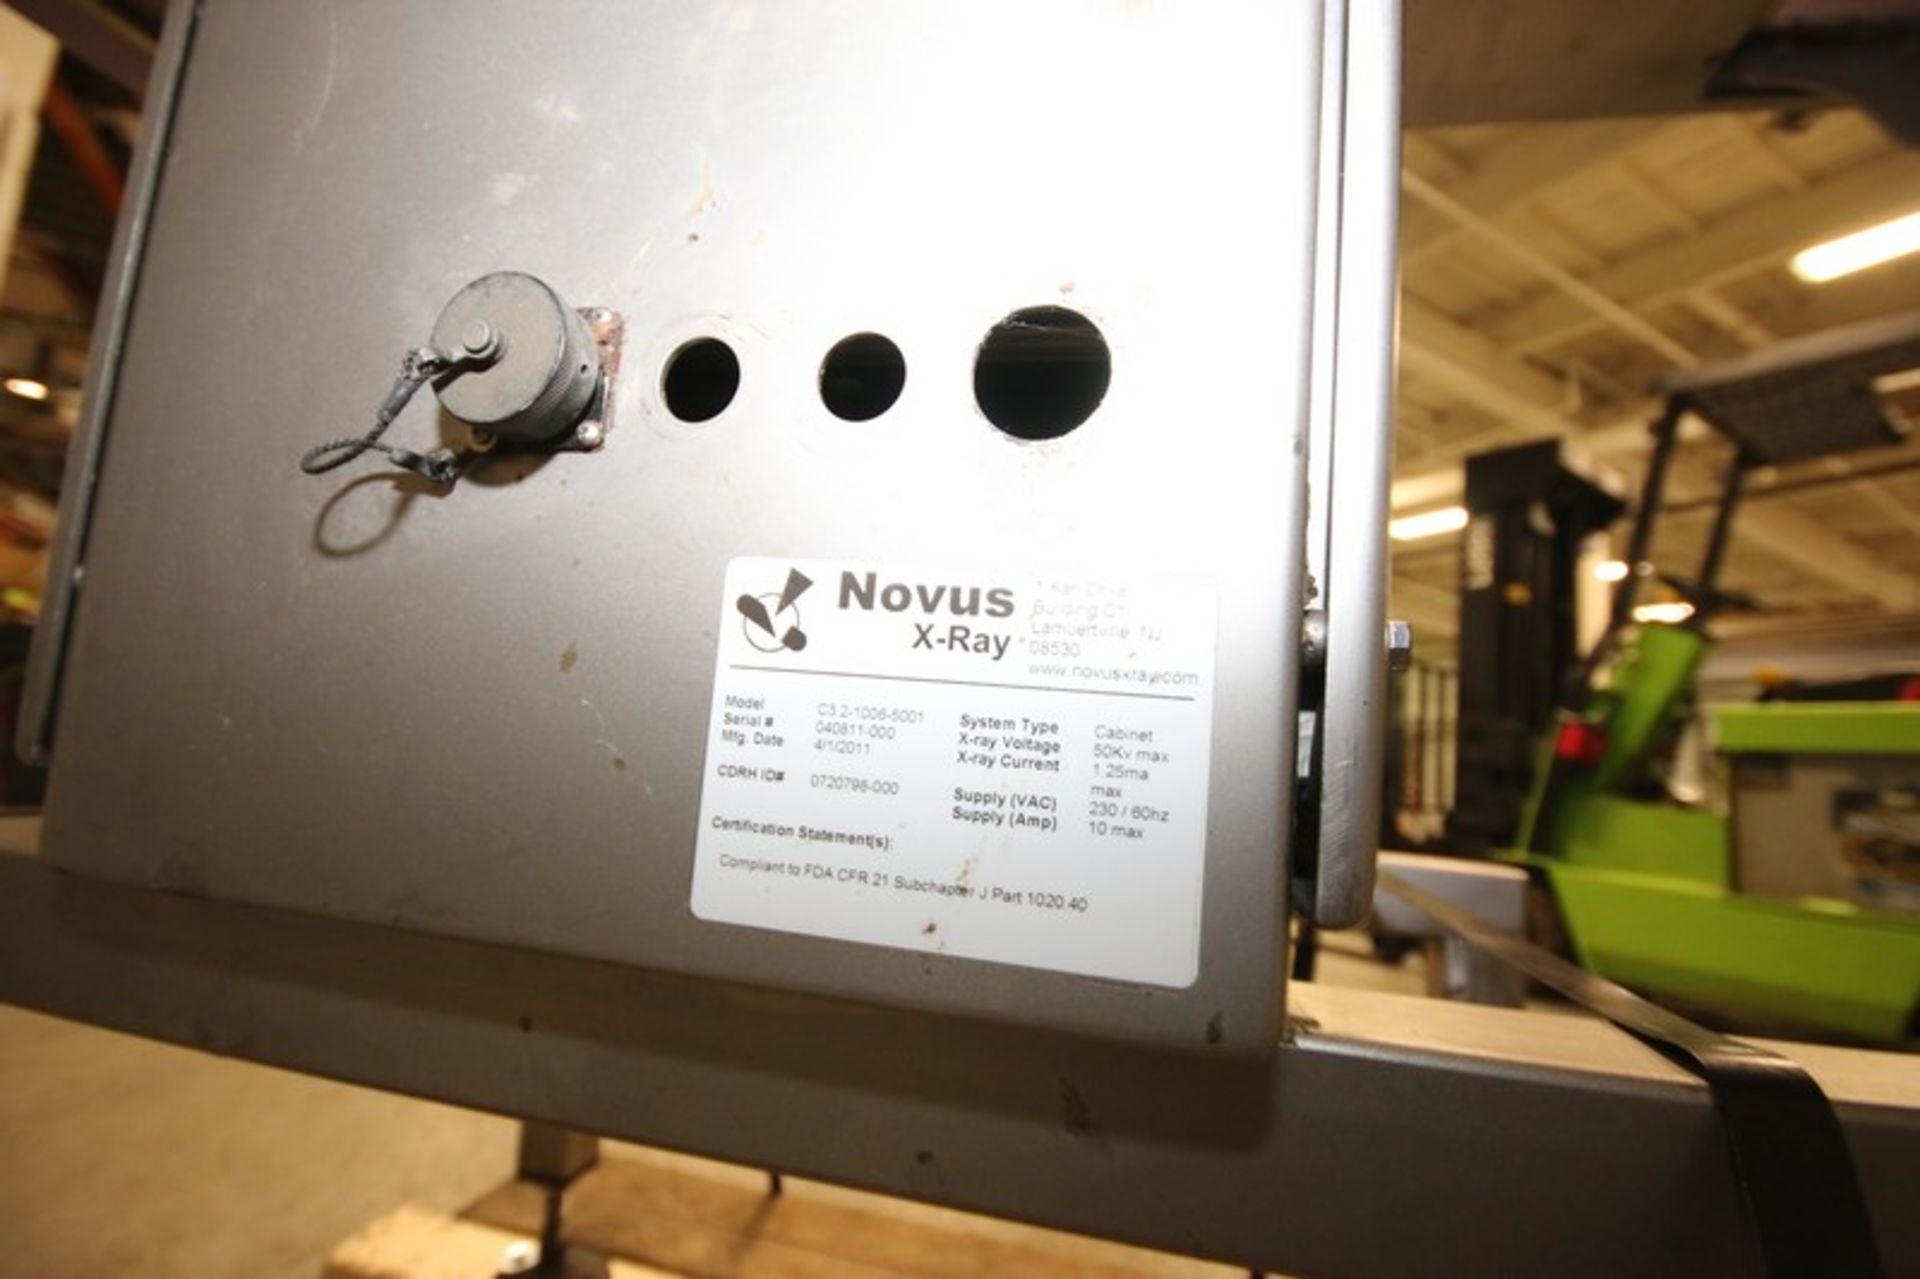 "Lot 9 - 2011 Novus S/S X-Ray, M/N C3.2-1006-5001, S/N 040811-000, with Control Screen, with Aprox. 15"" W x"